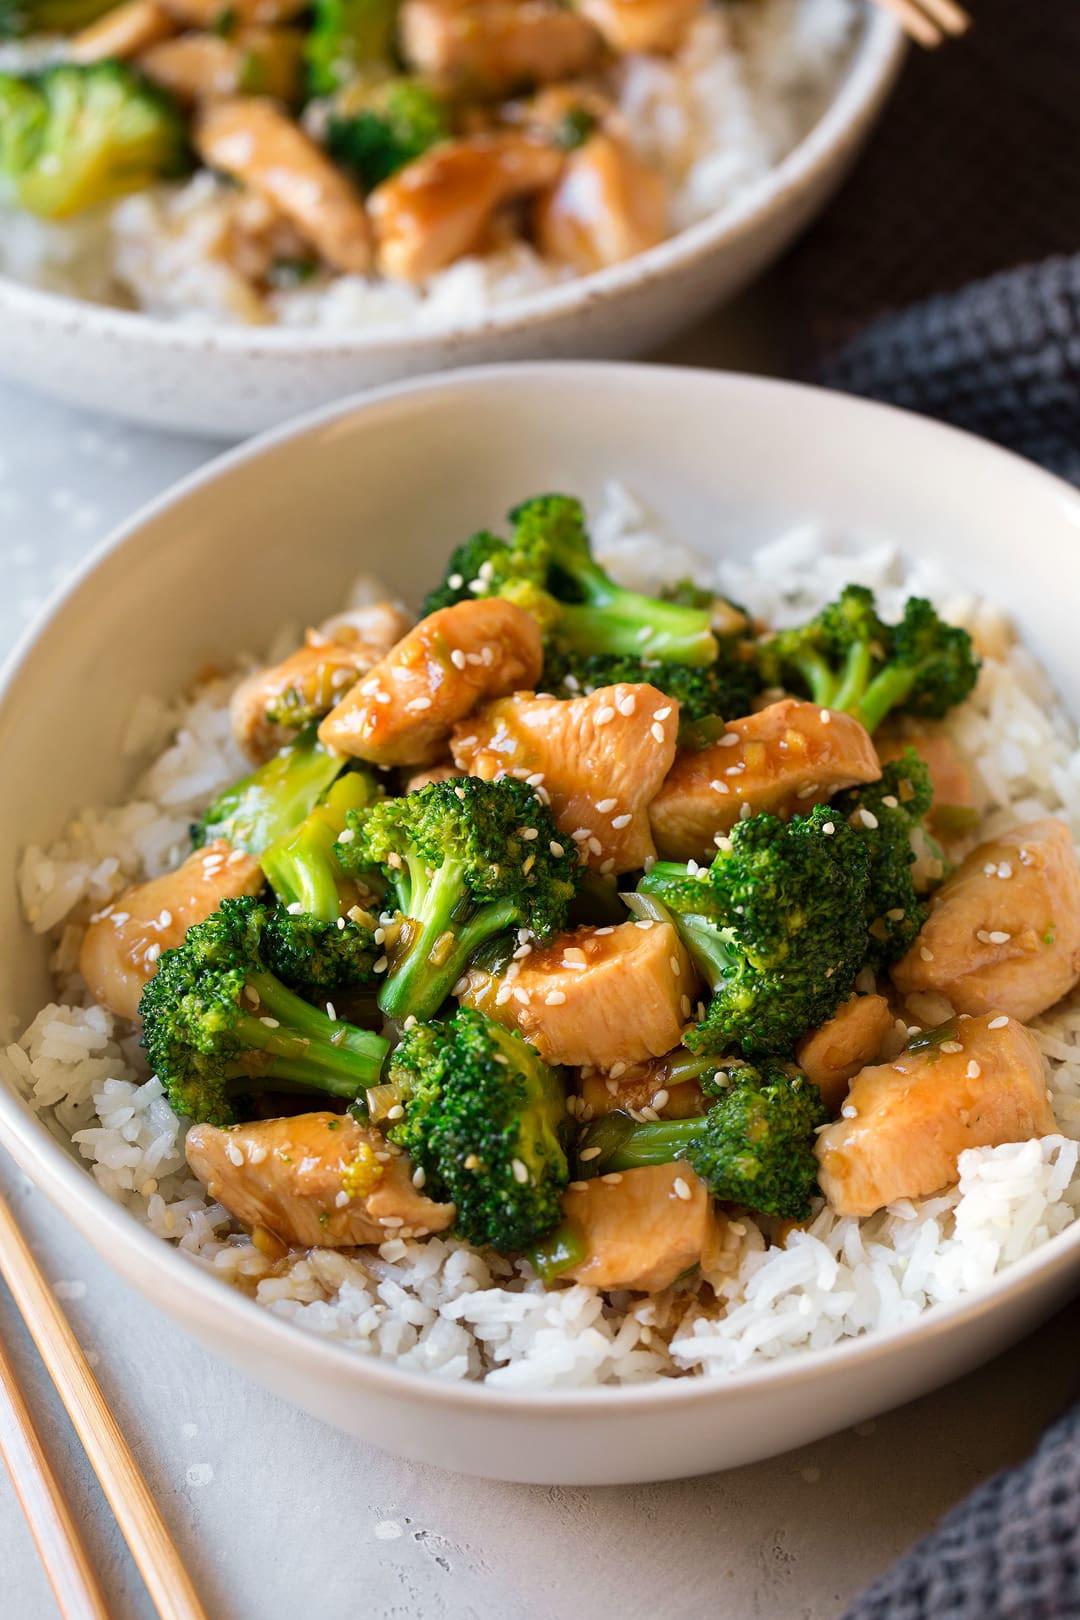 Healthy Chicken And Broccoli Stir Fry  Chicken and Broccoli Stir Fry Cooking Classy